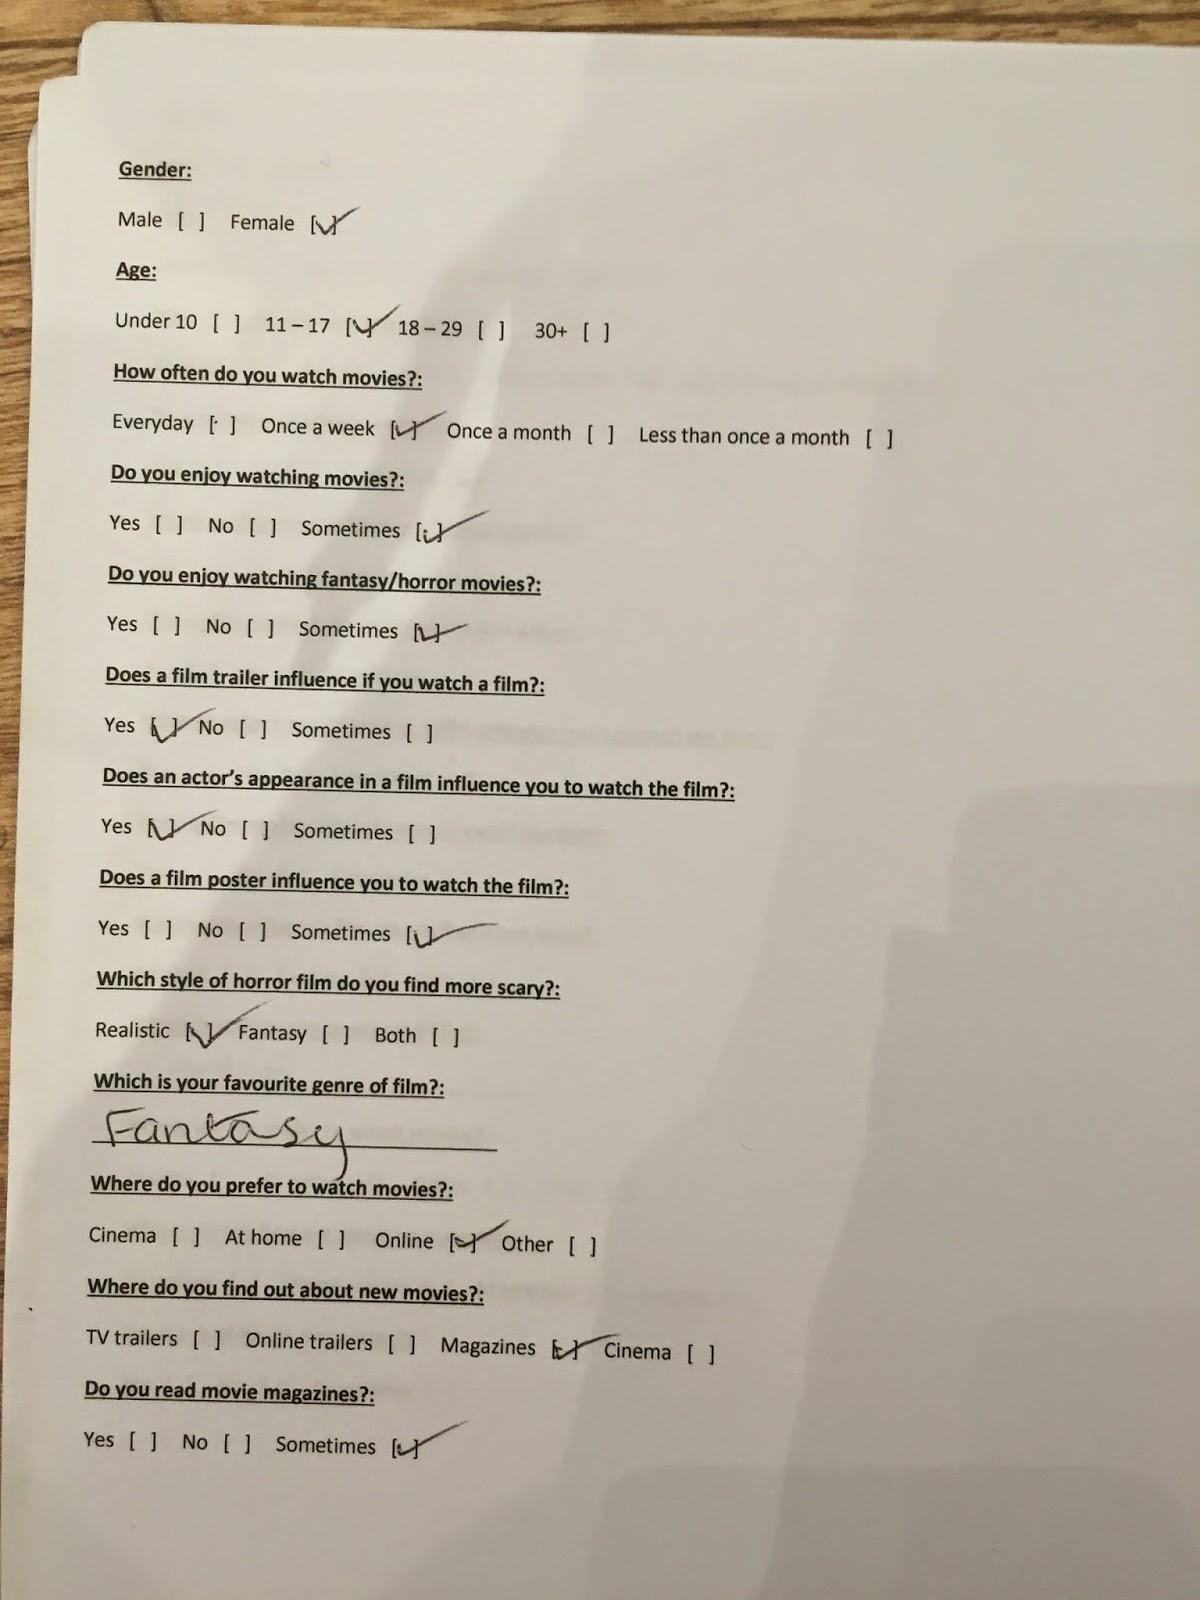 Tesco qr code case study image 2